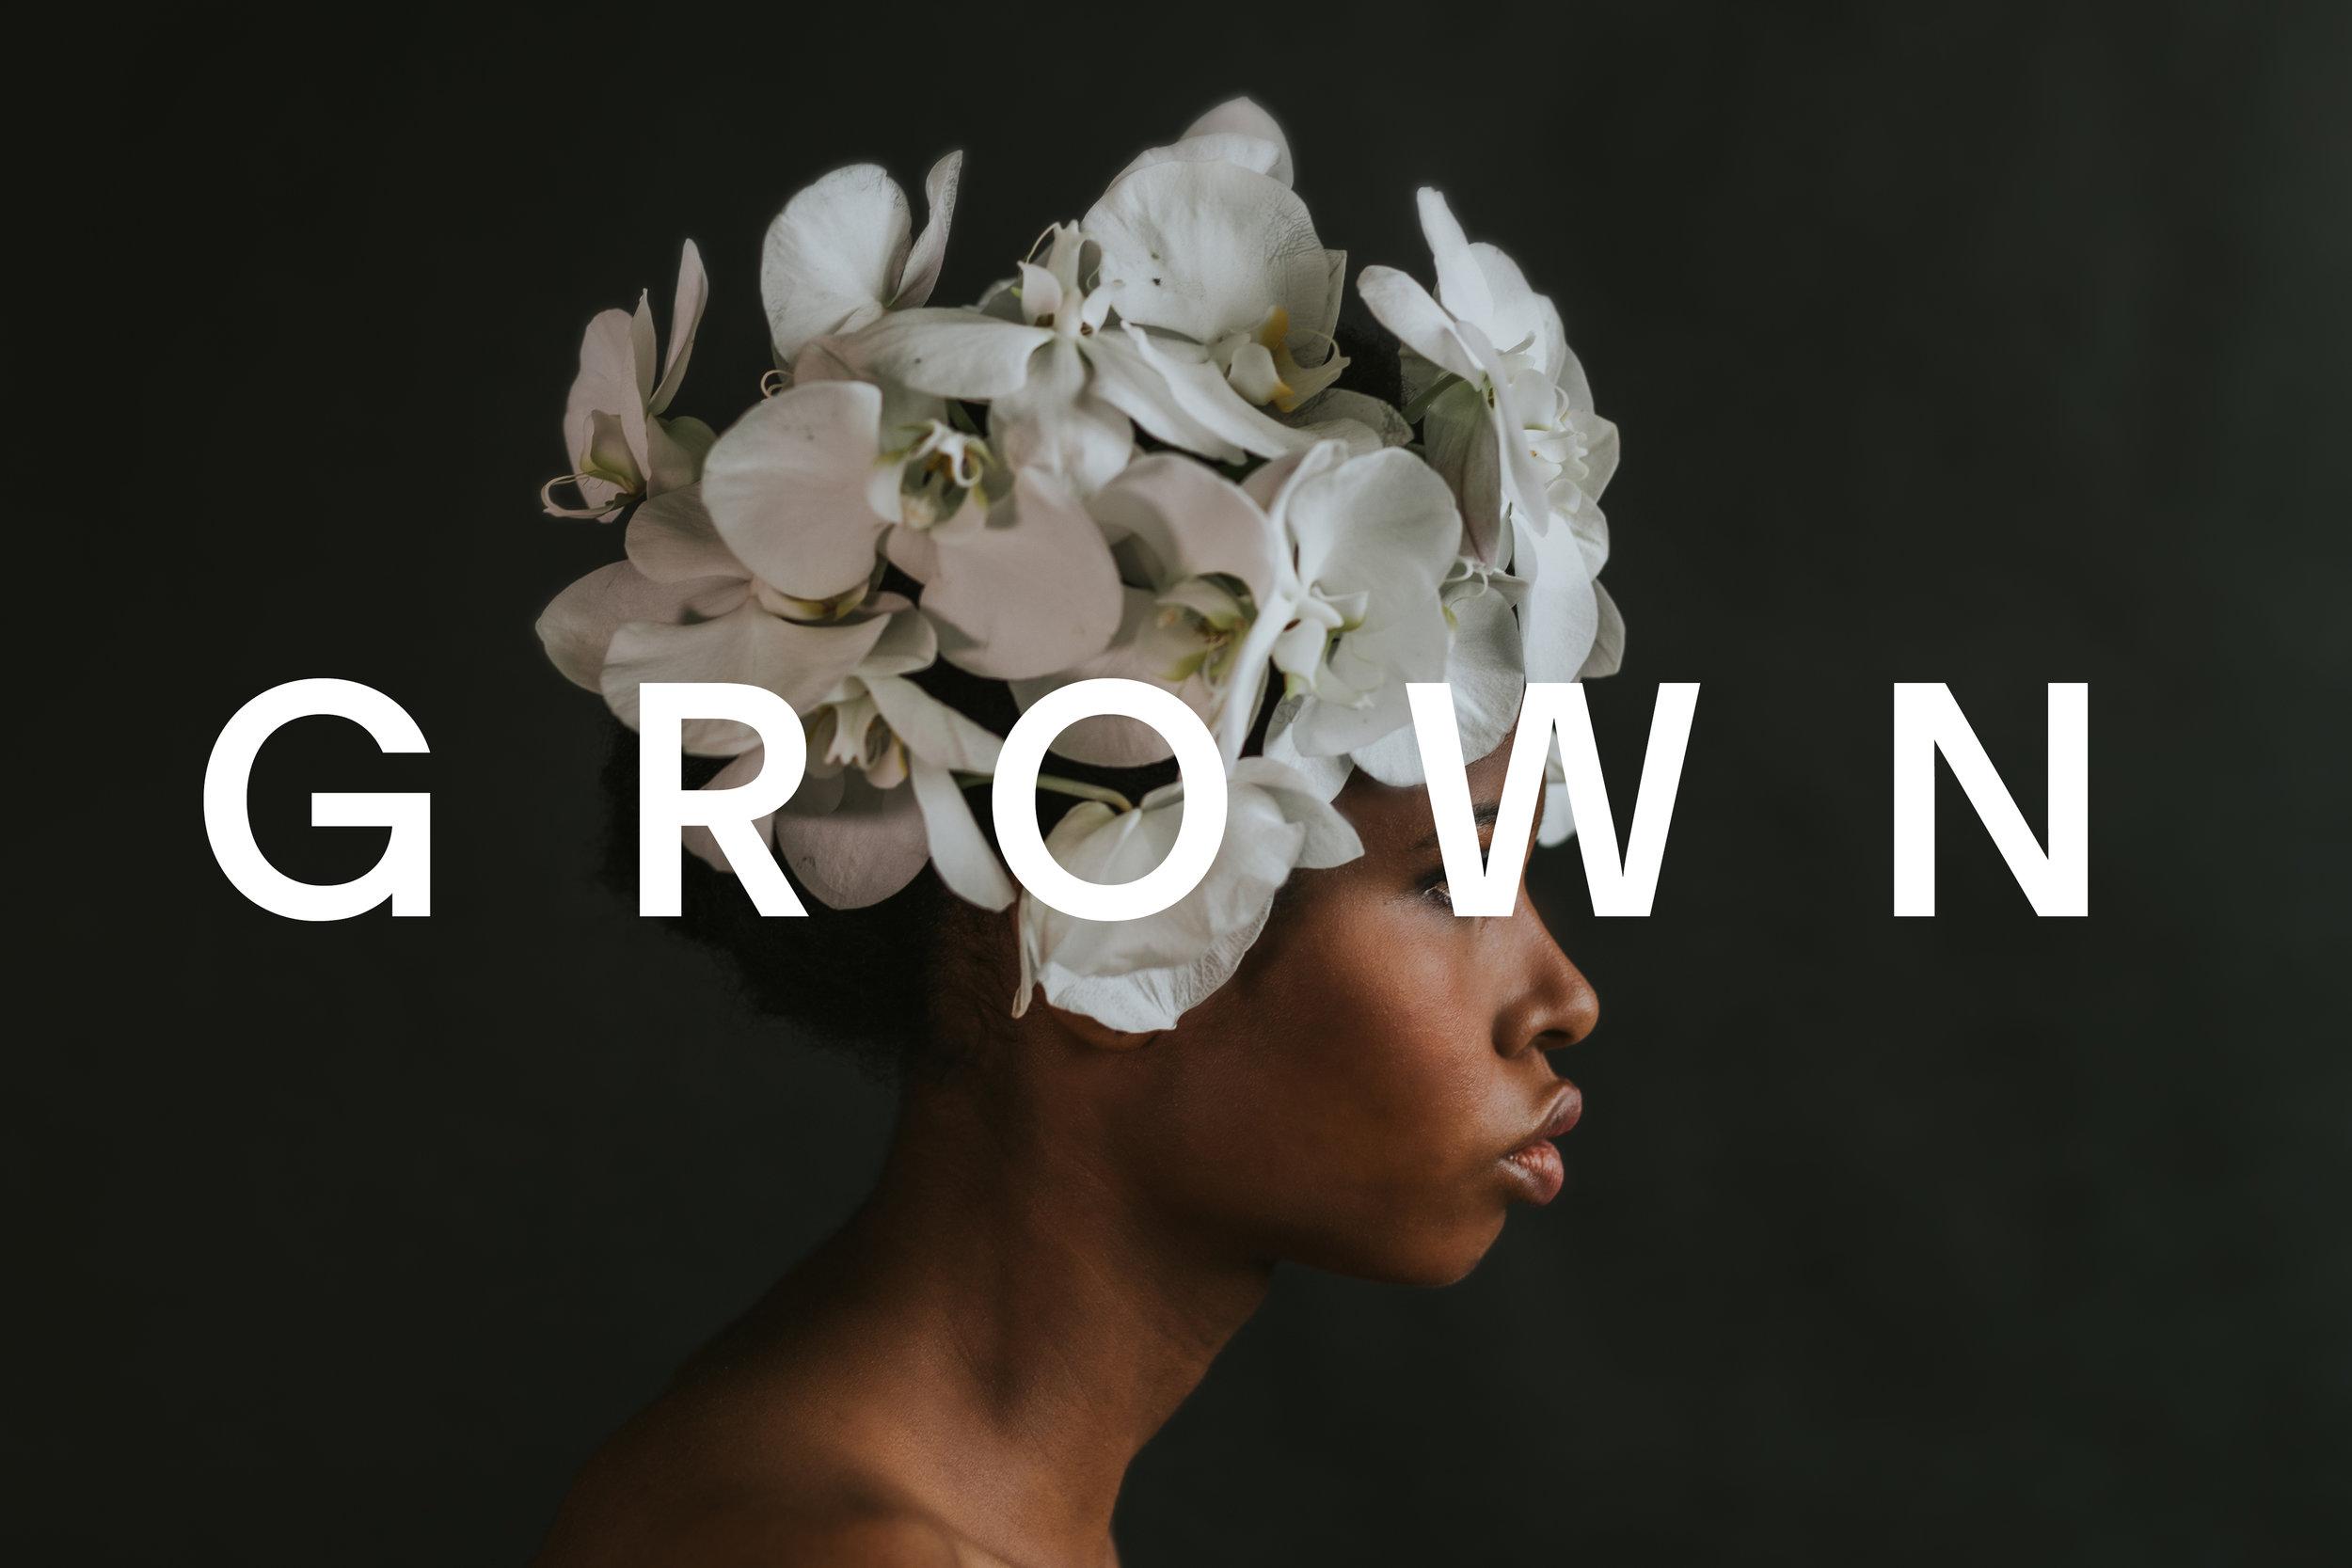 Grown_titlecard.jpg